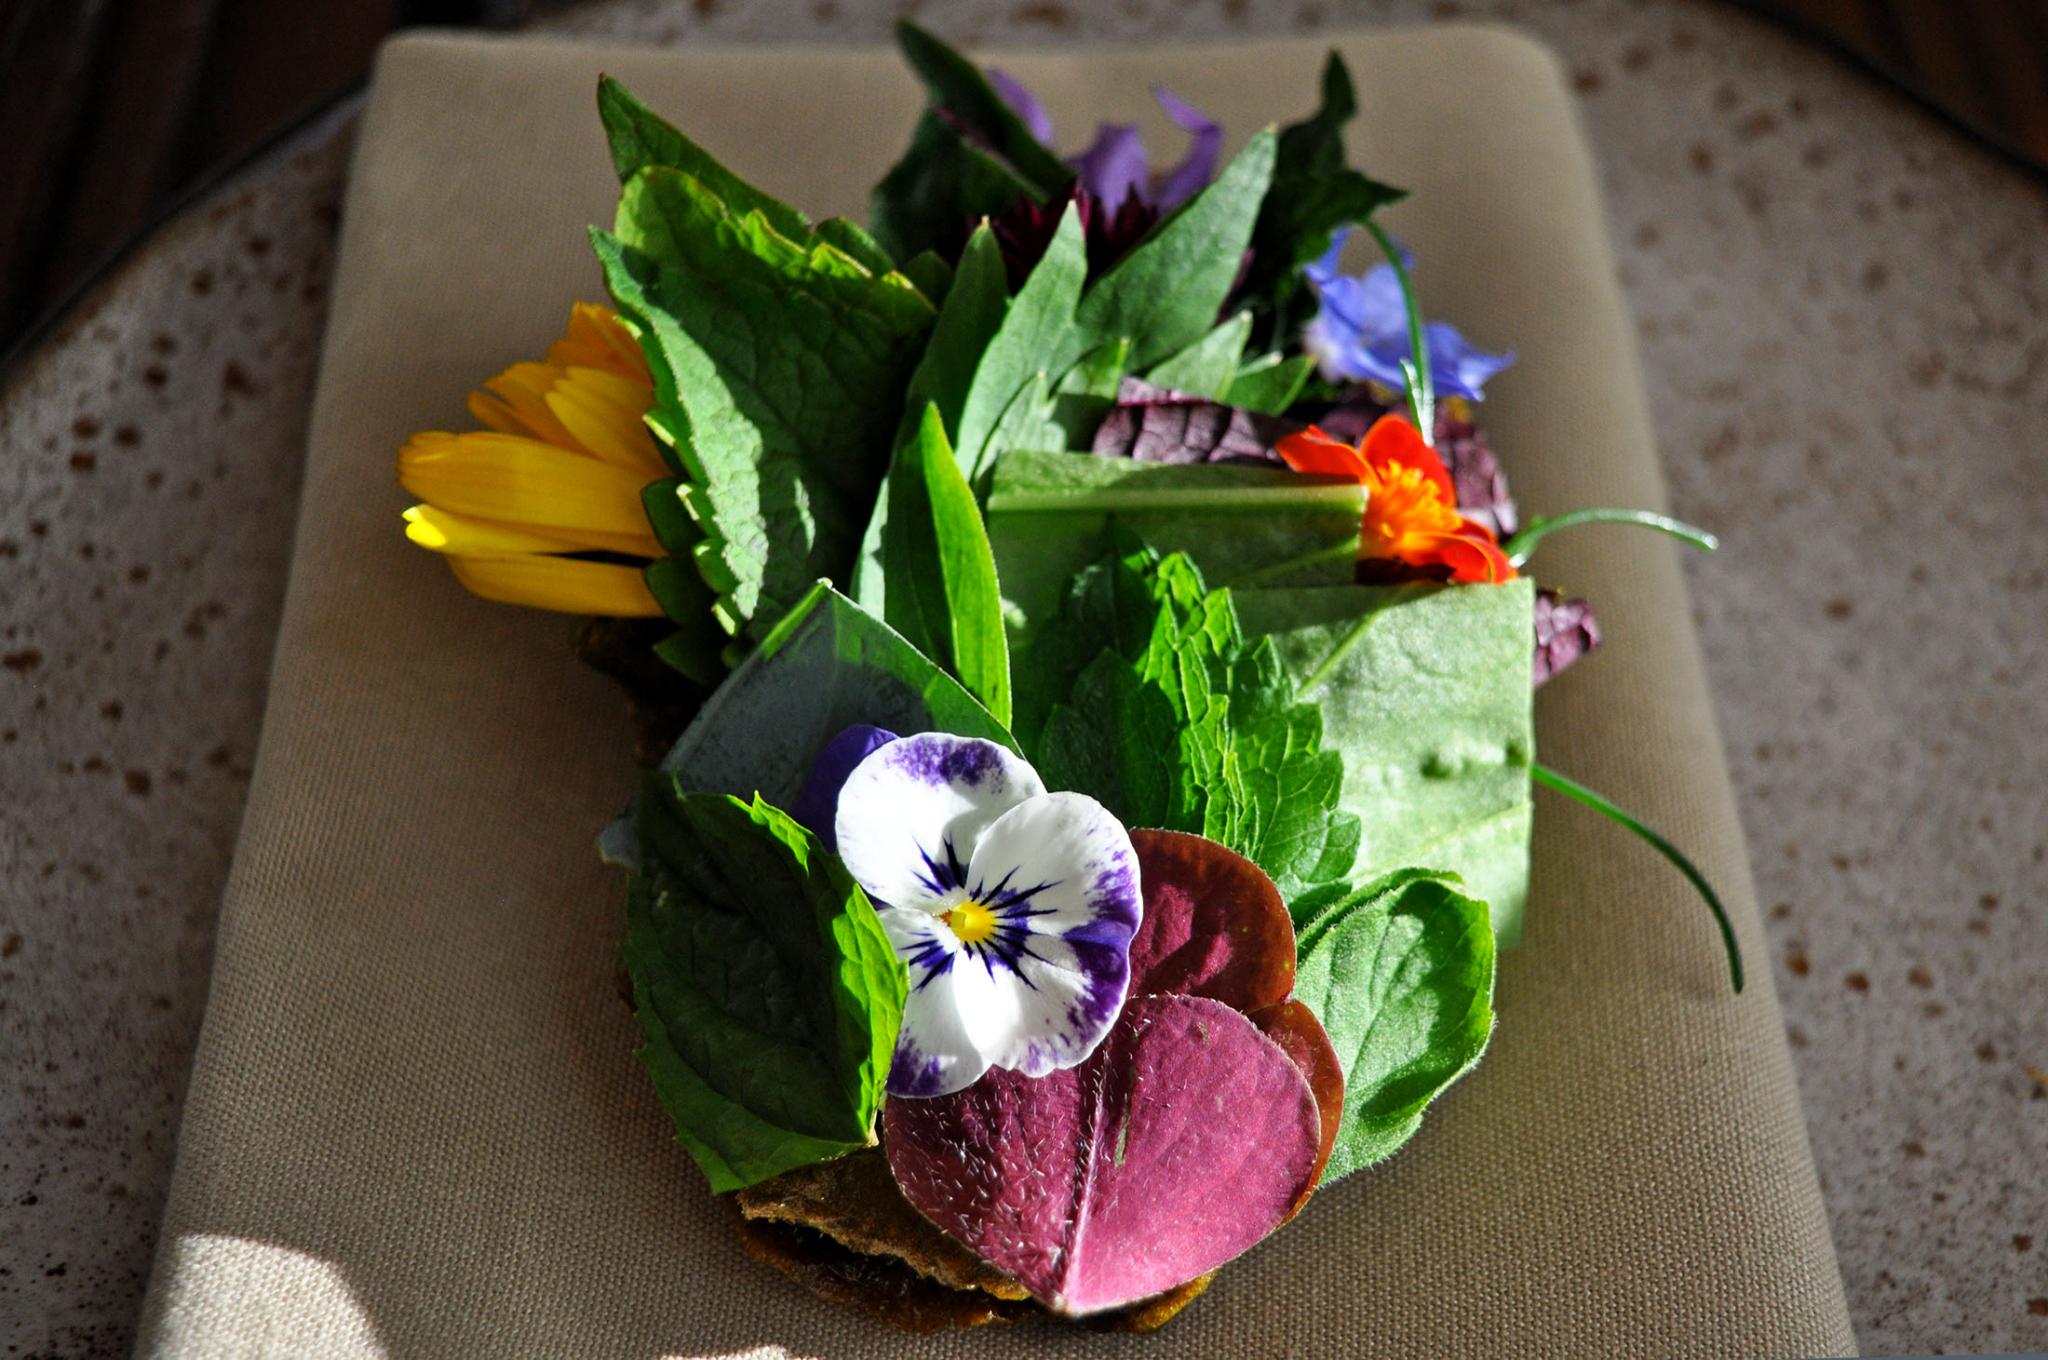 Food at Willows Inn Restaurant - Environmental Storytelling